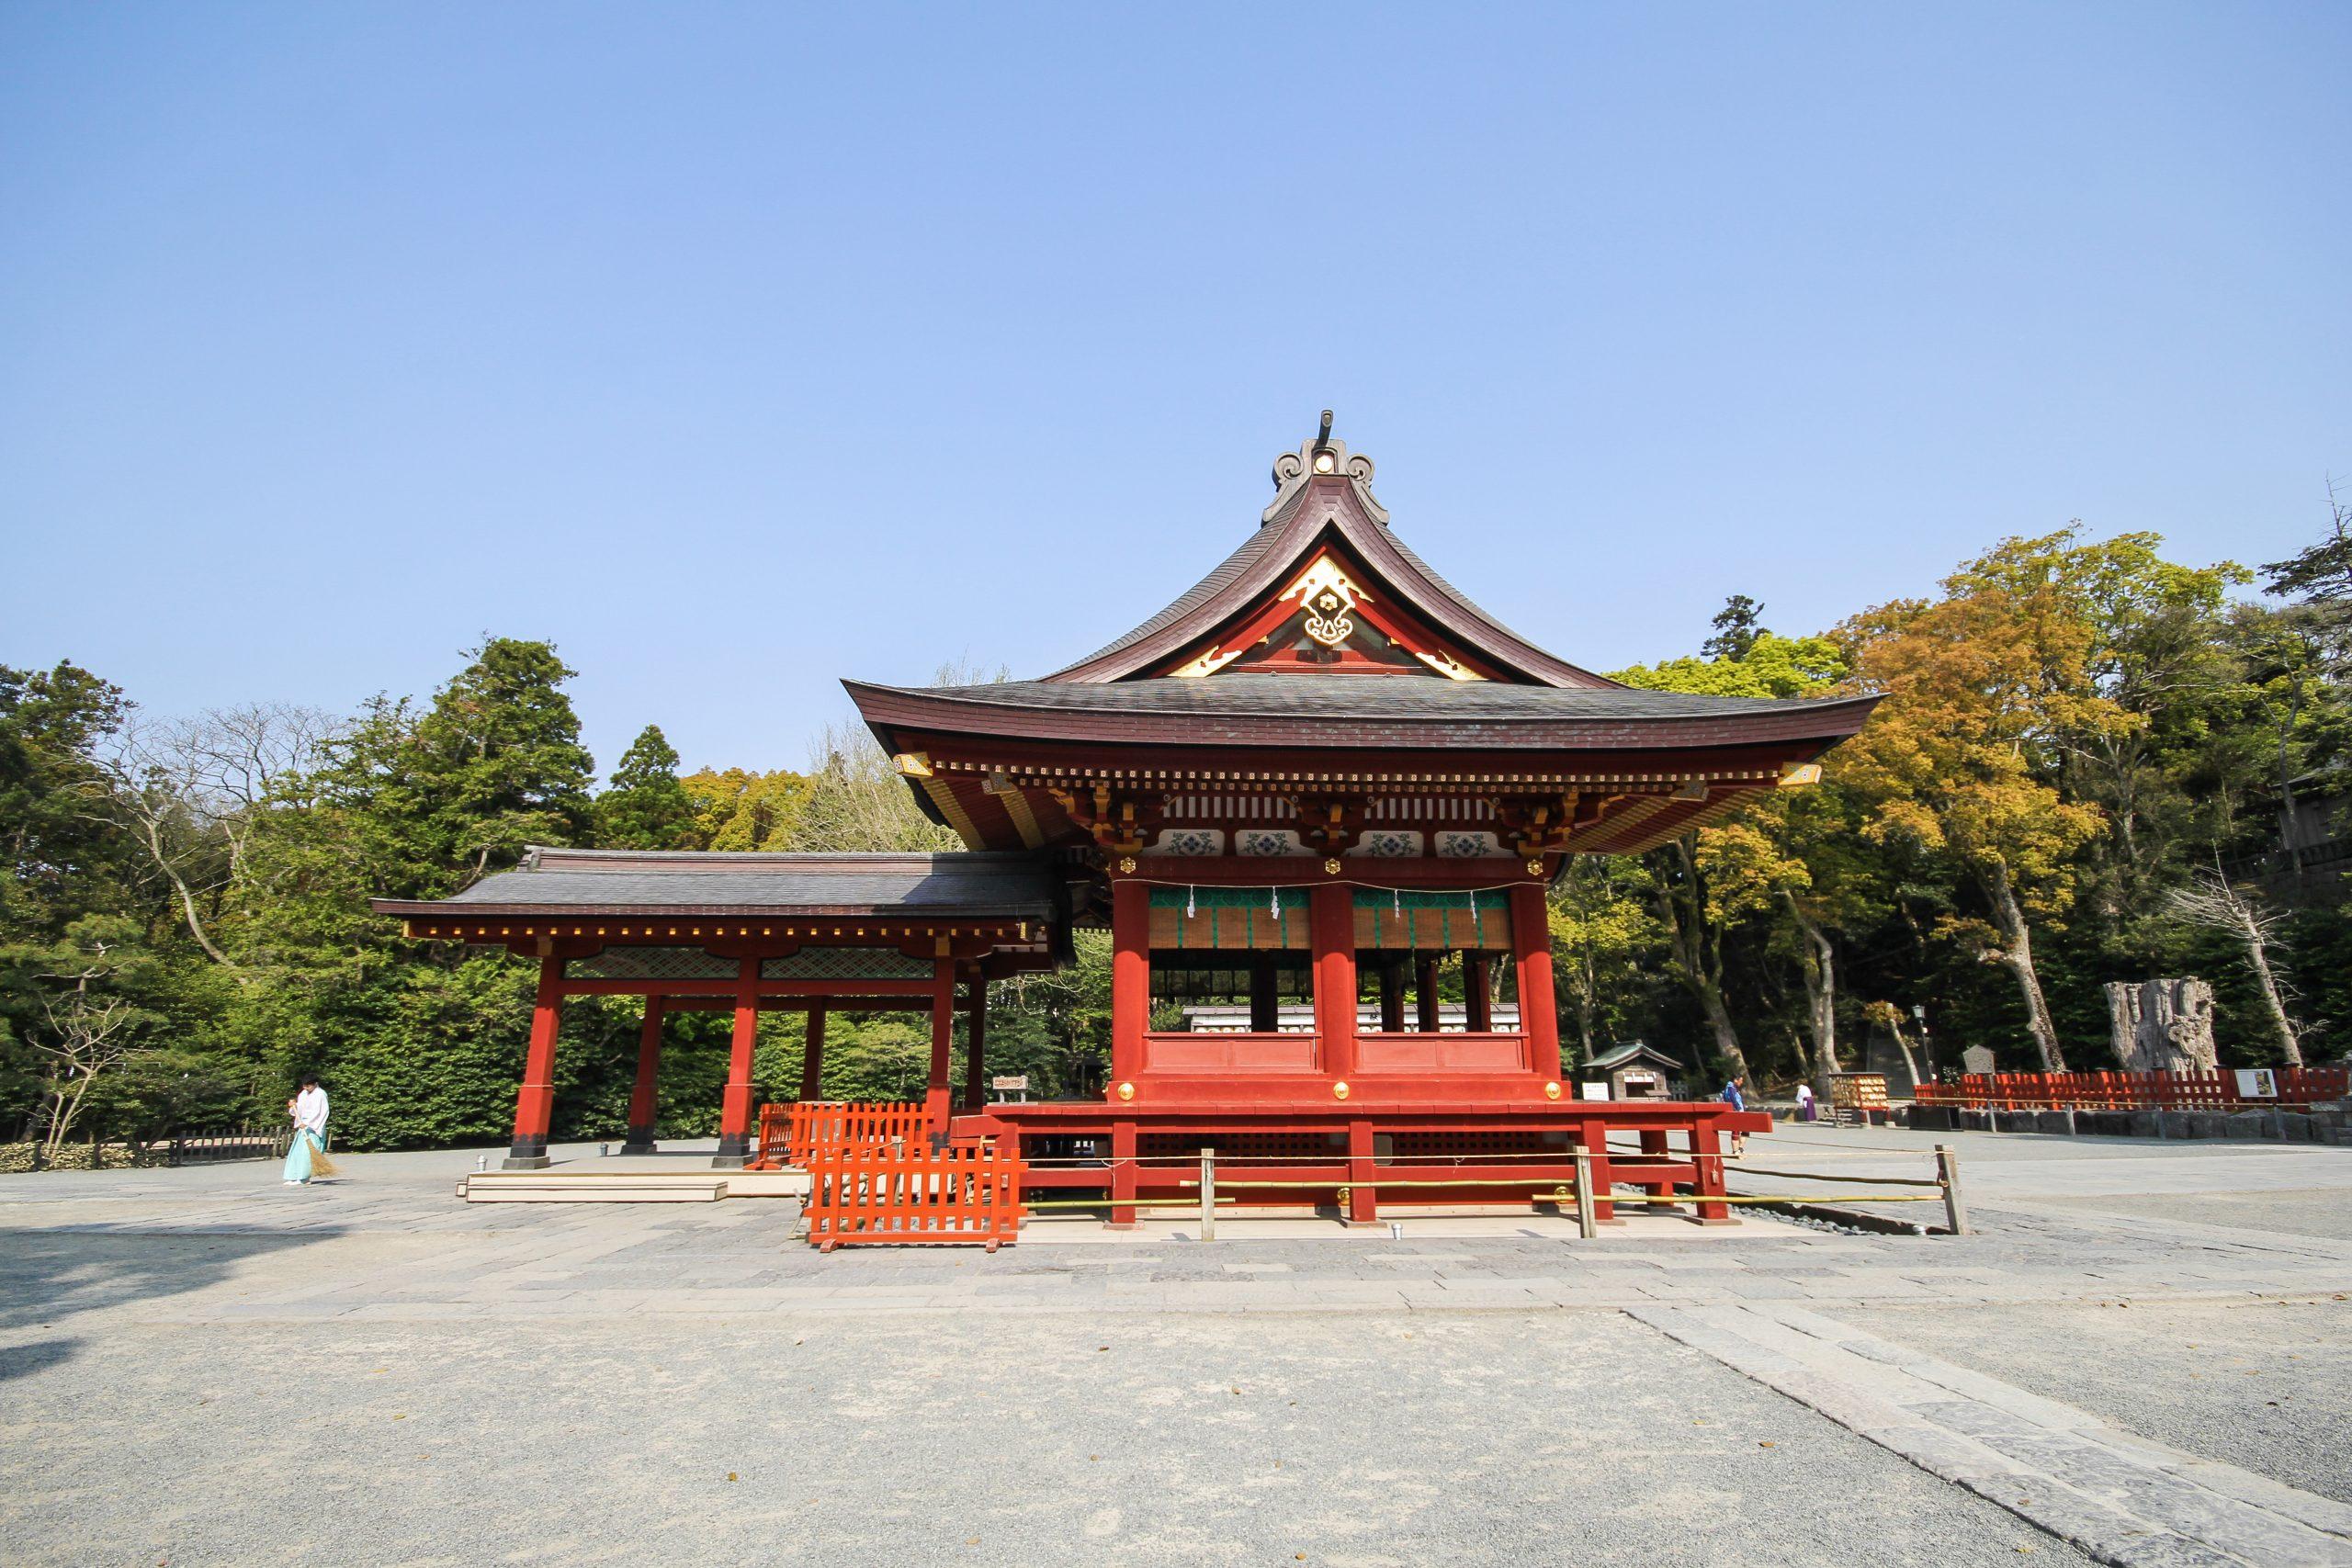 Visit The Tsurugaoka Hachimangu Shrine On Your Kamakura Walking Tour And Tea Ceremony